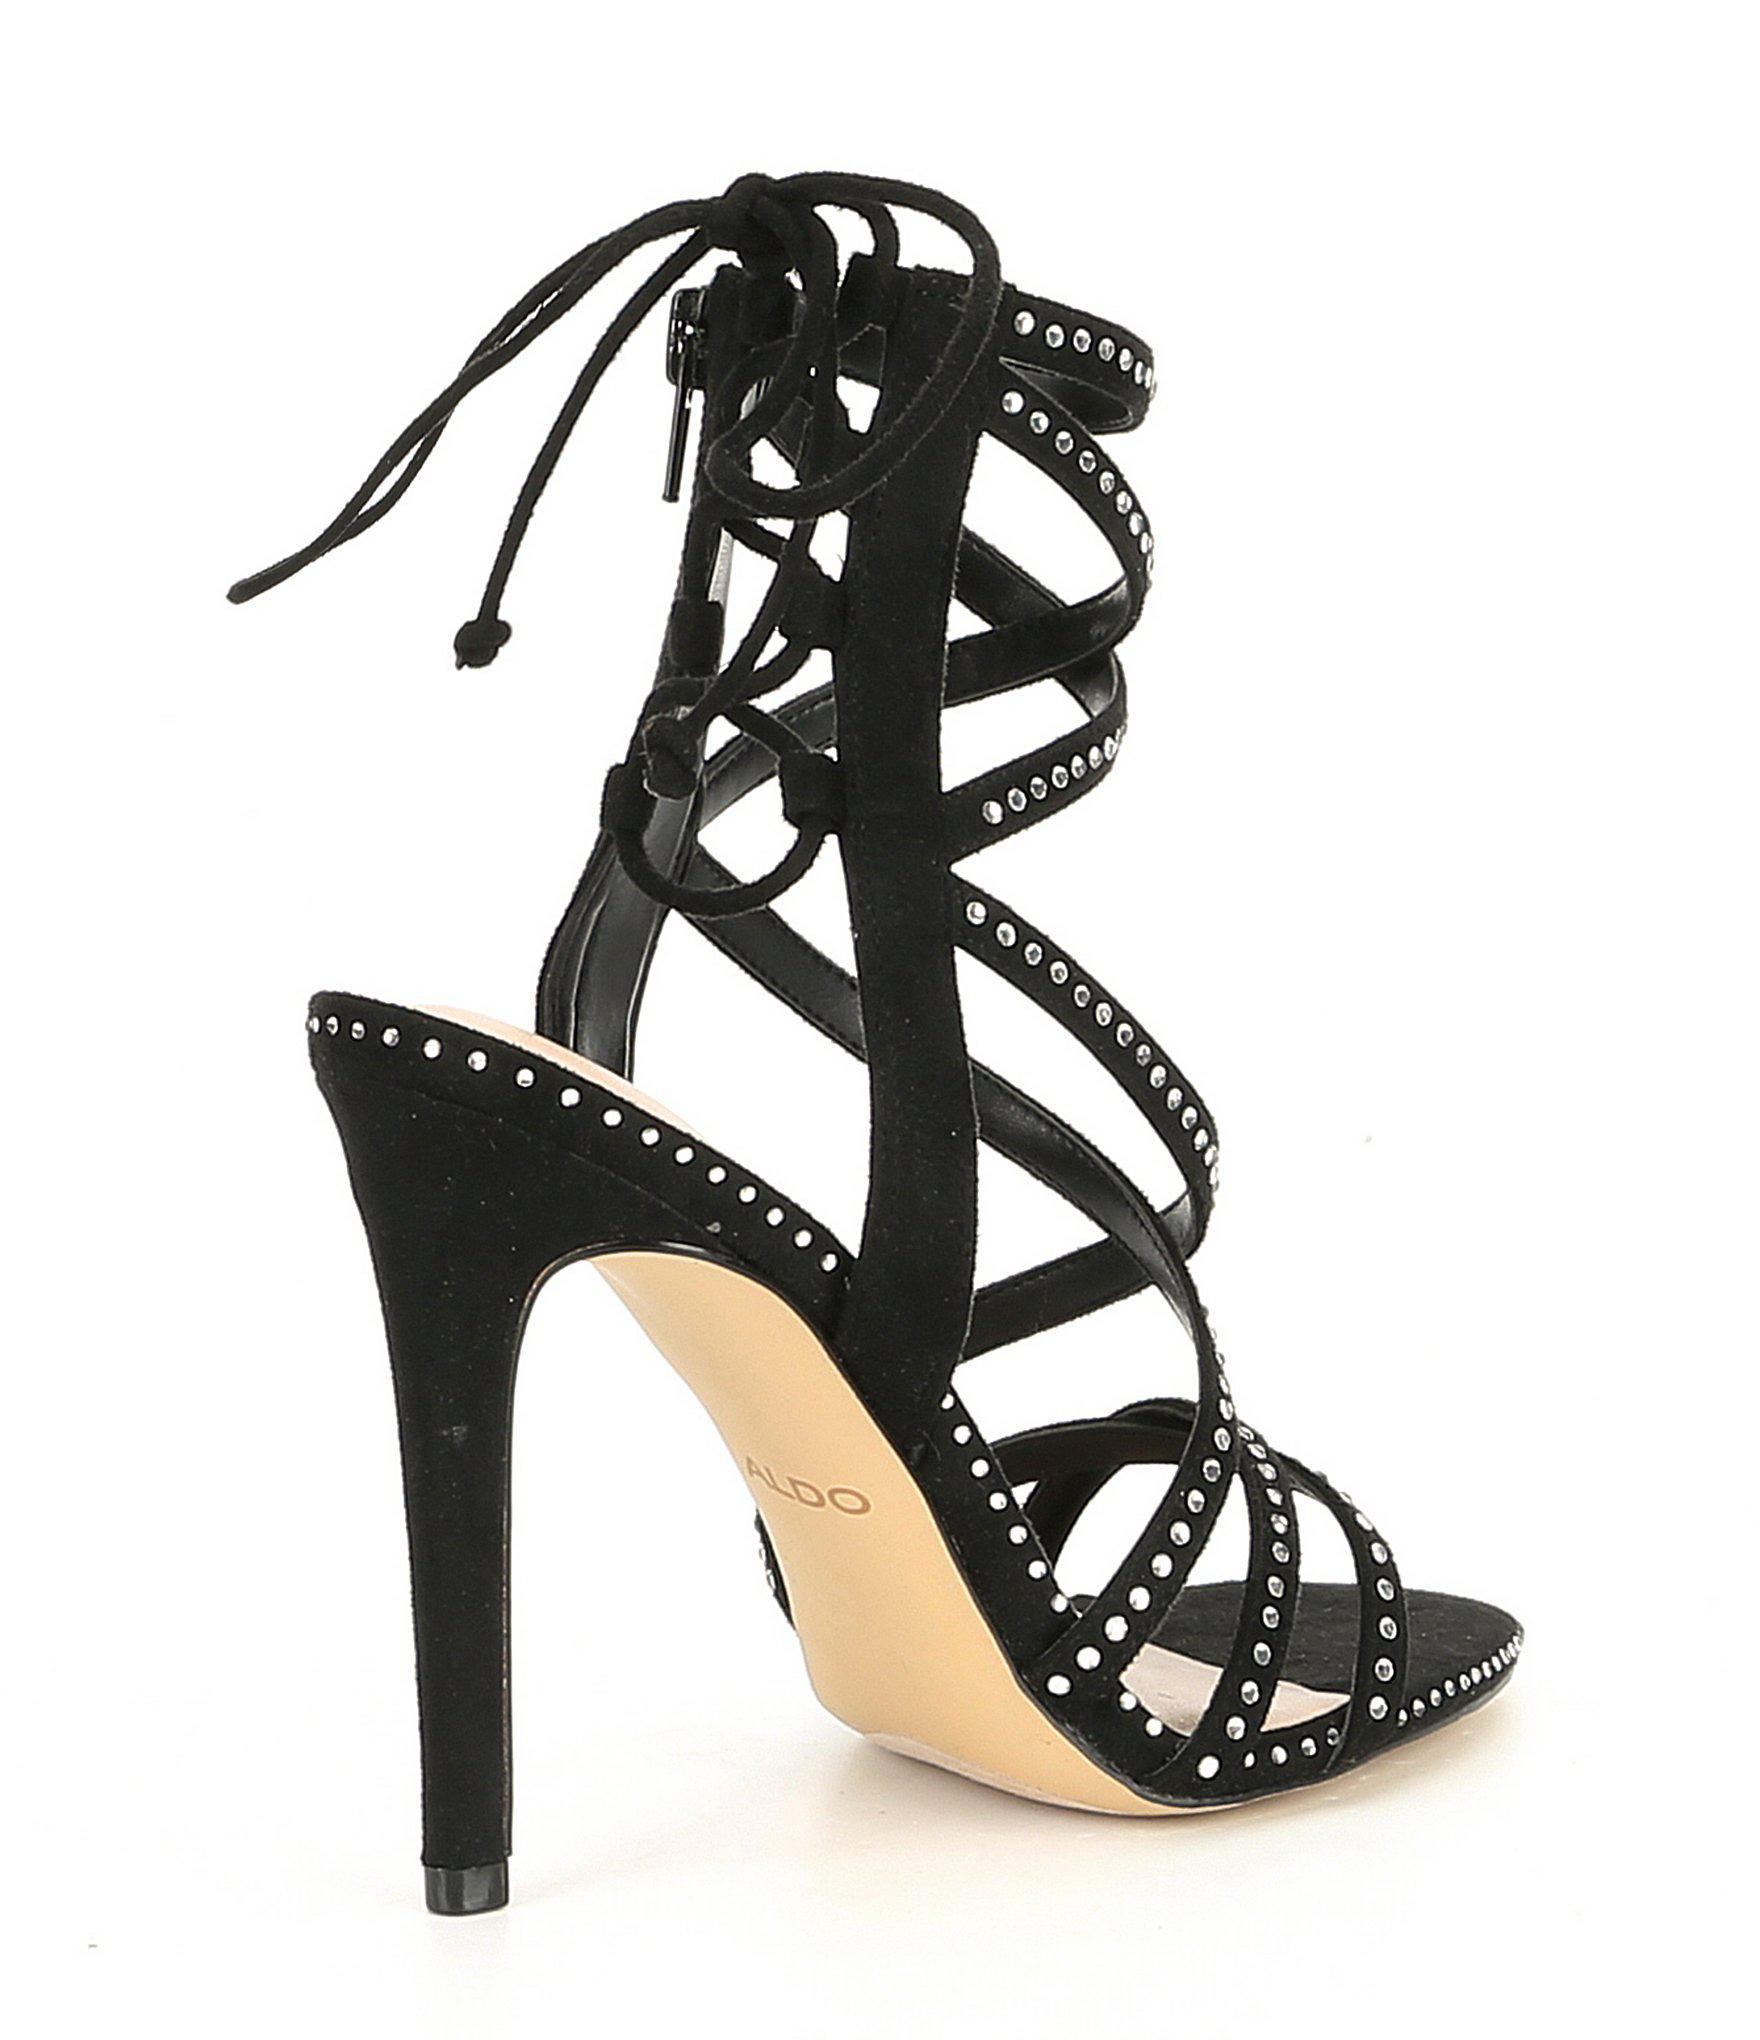 89b029f689d ALDO - Black Rubert Banded Embellished Dress Sandals - Lyst. View fullscreen